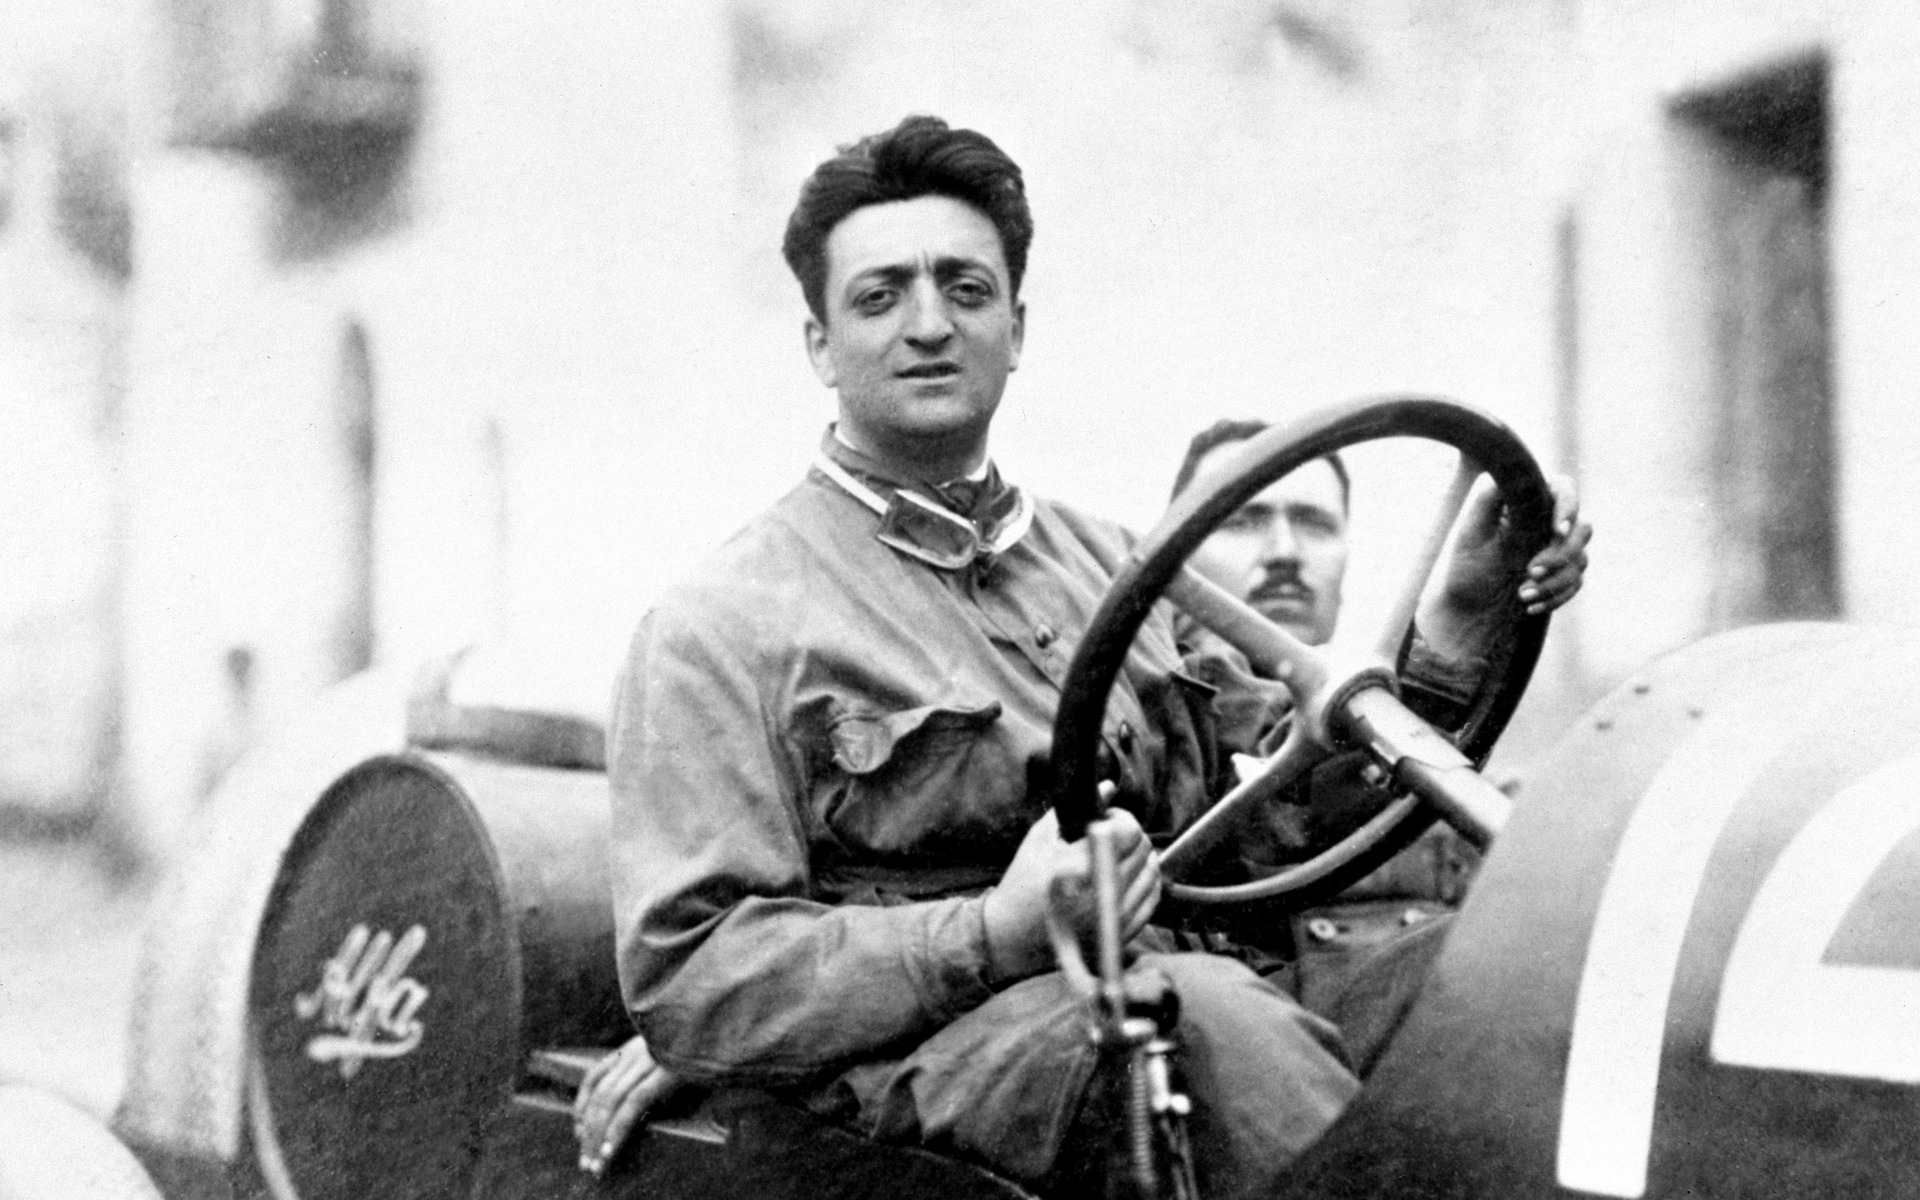 Enzo Ferrari au volant d'une Alfa Romeo.